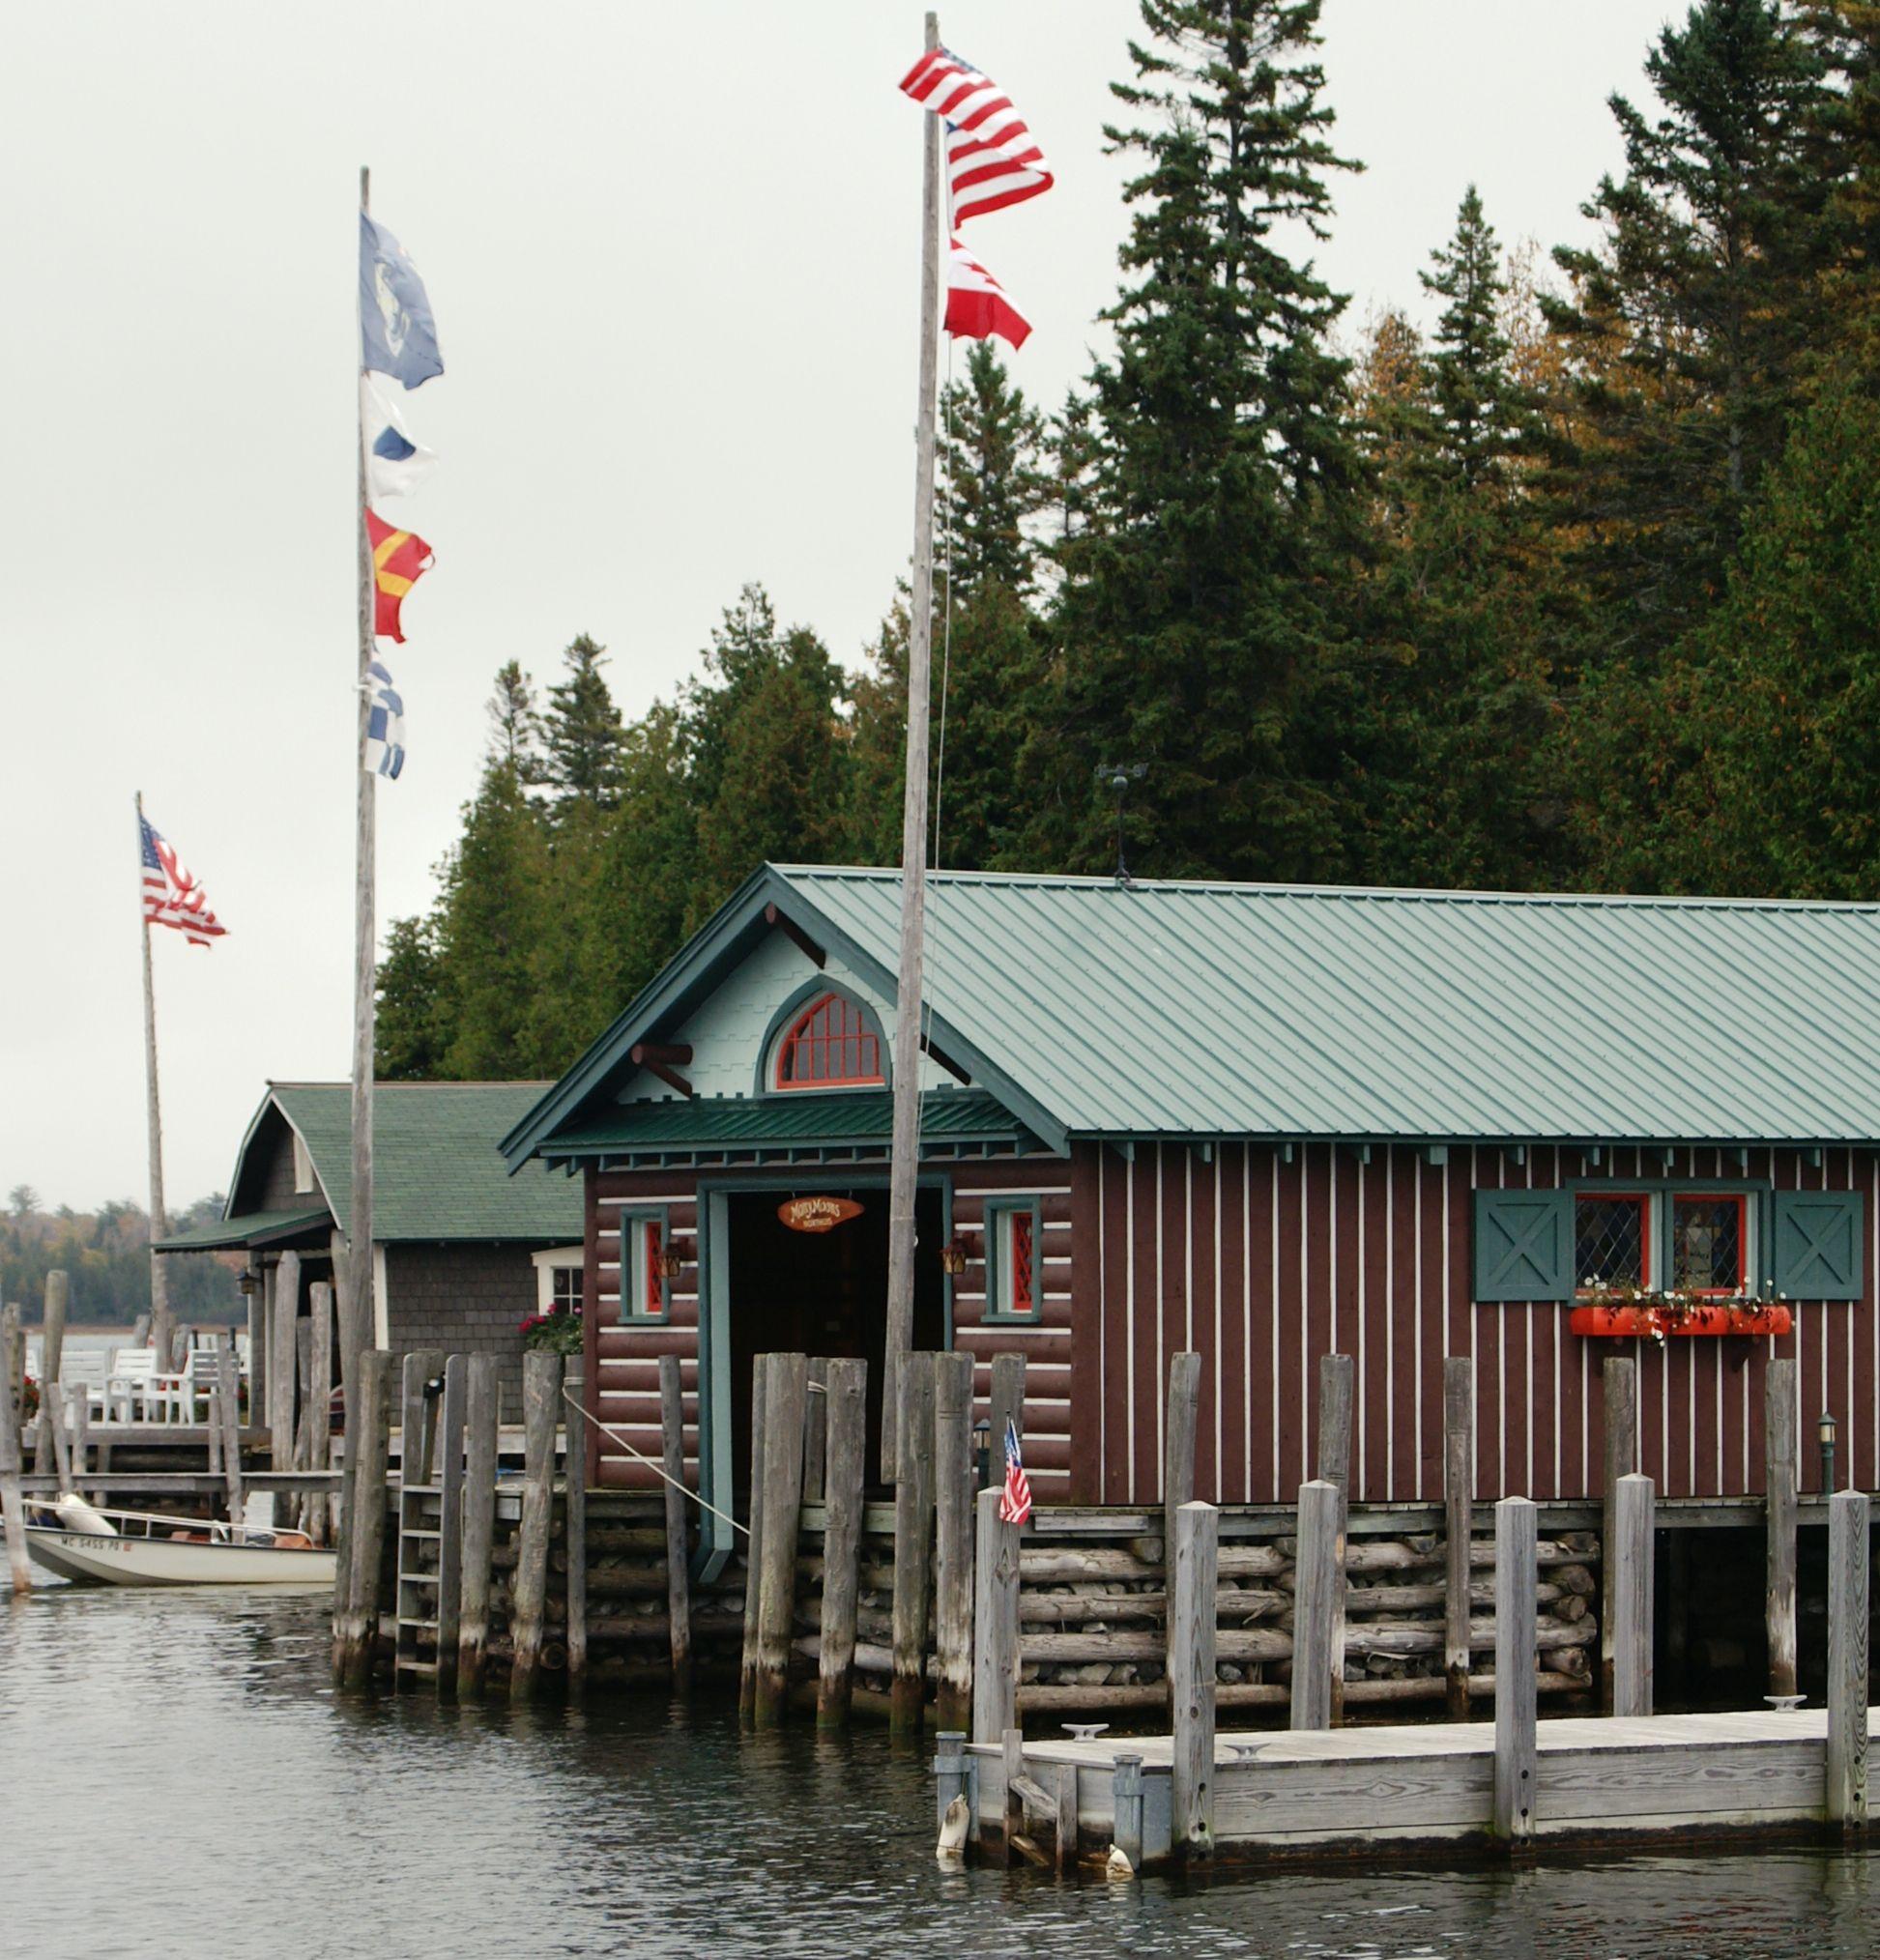 Lake House Love In Michigan: Boathouses In Cedarville Bay, Near Viking Boat Harbor